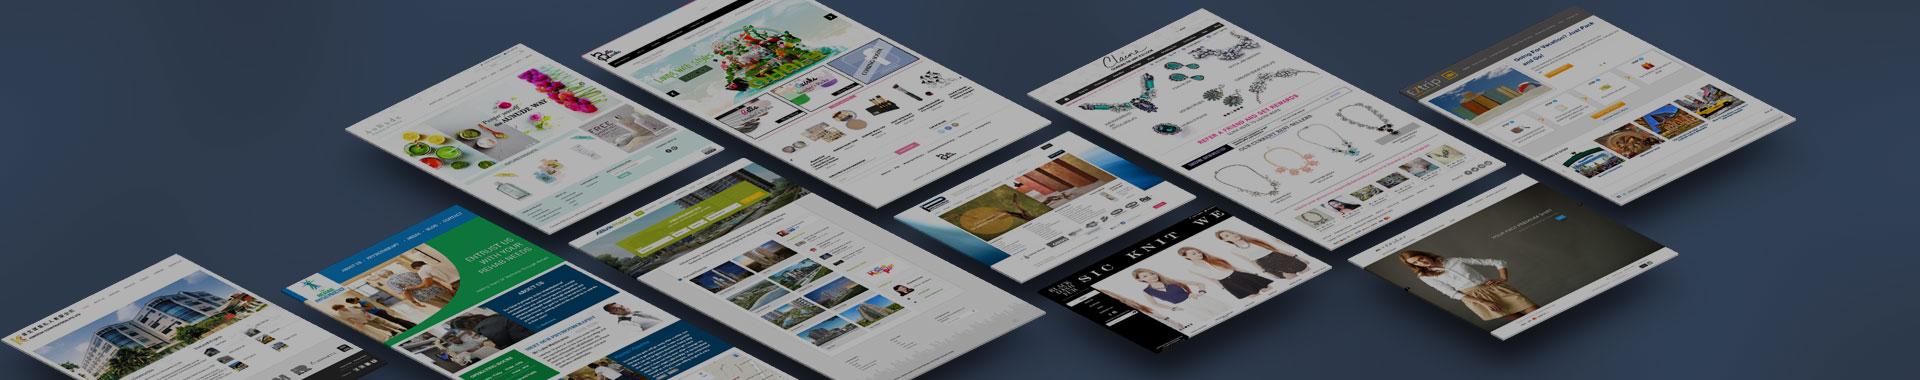 Website Design Singapore - Creme On Top